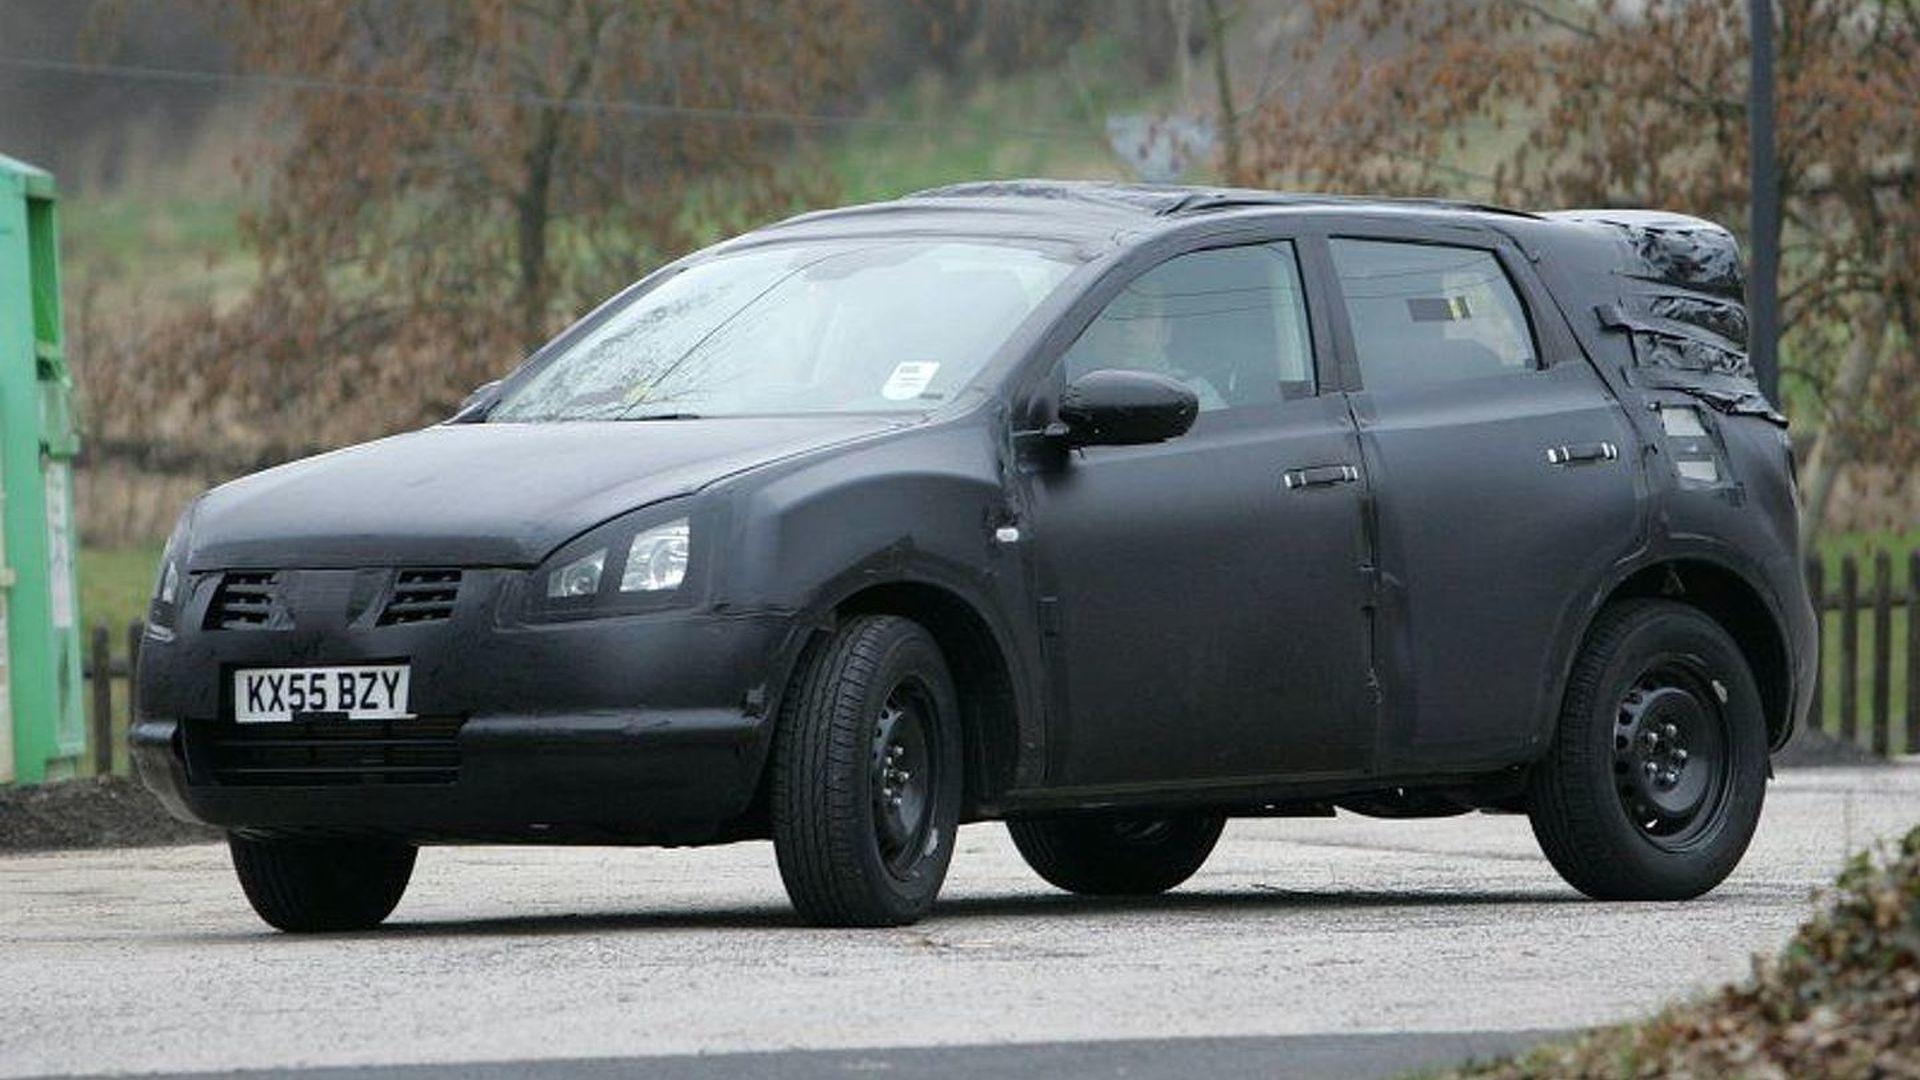 New Nissan Qashqai Spy Photos Captured